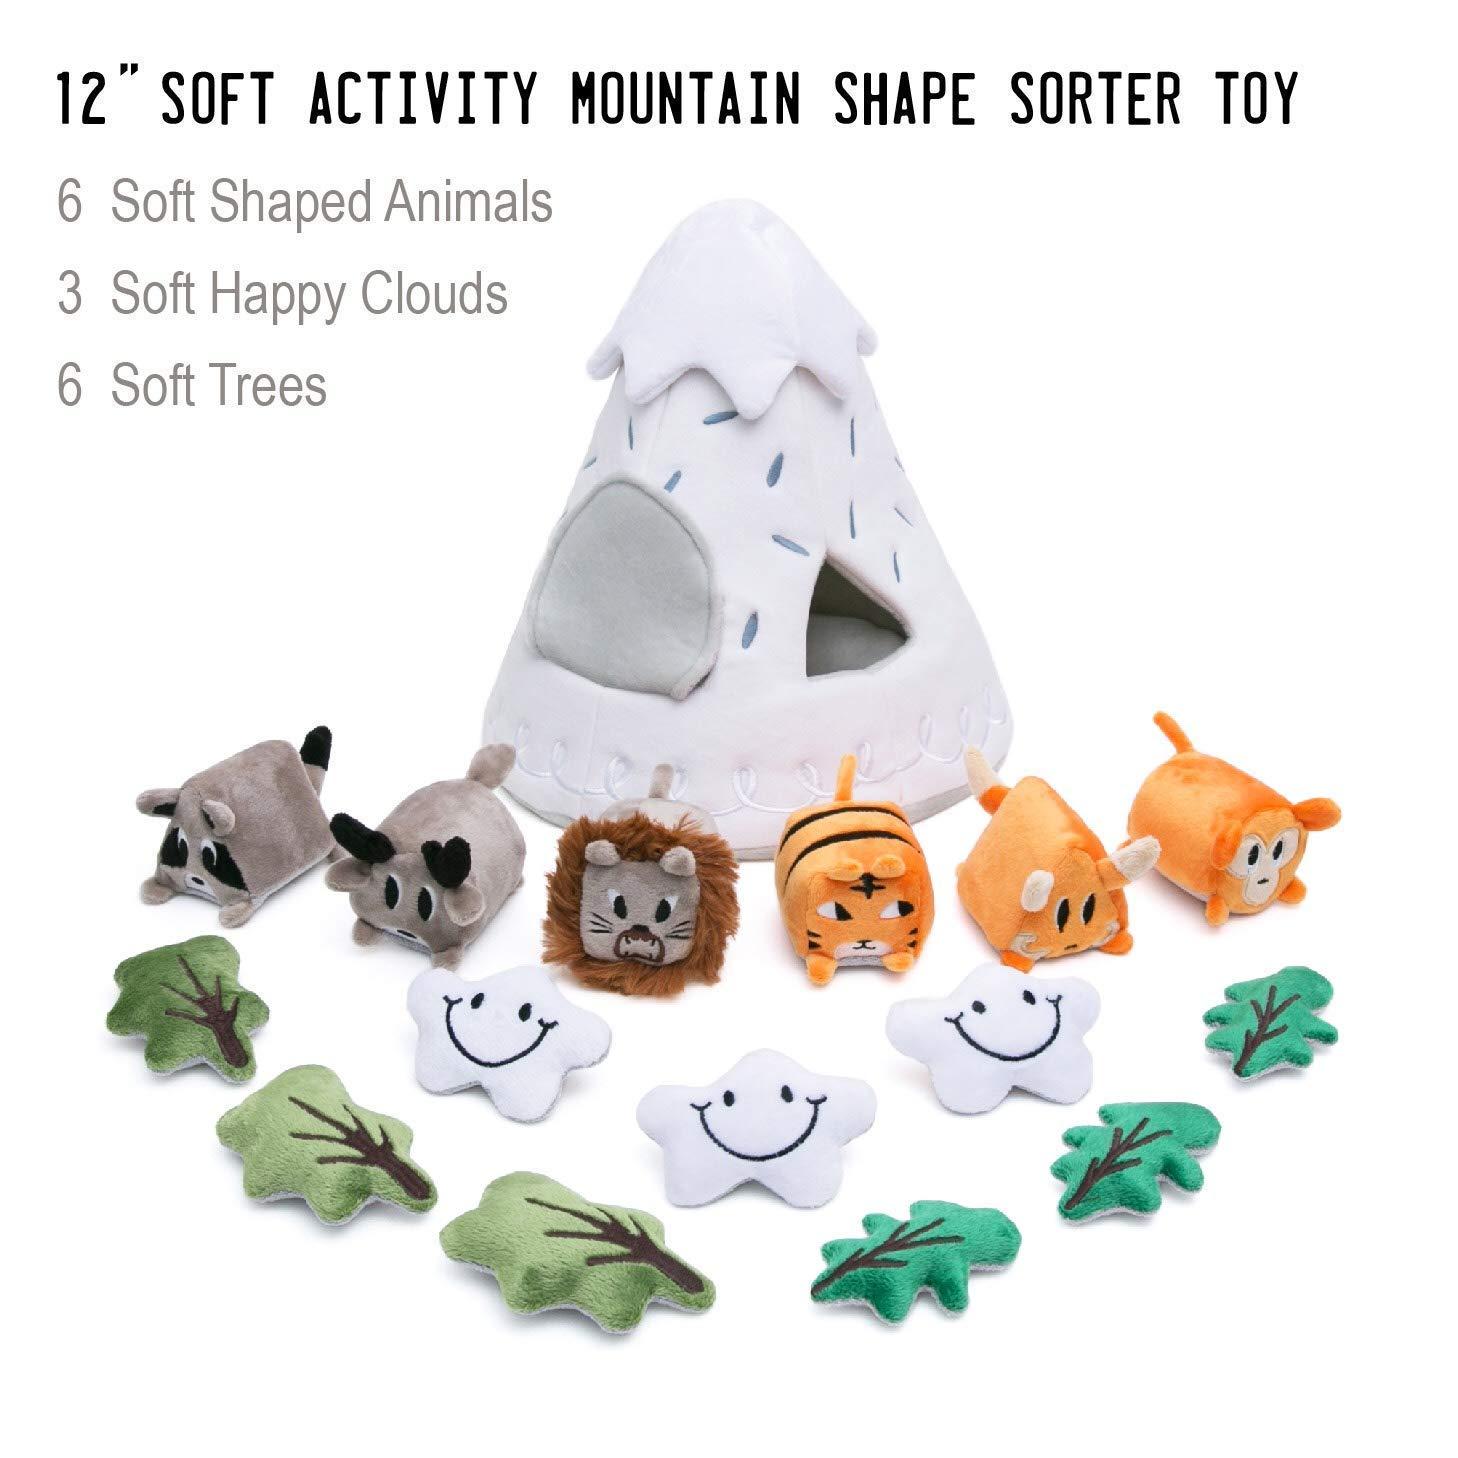 OK!DZO 12'' Mountain & Animal Shape Sorter Plush Developmental Toy Set (16 pcs)- Cognitive & Motor & Social Skills- Fun Bright Colors & Textures for Babies 0-36 Months by OK!DZO (Image #2)